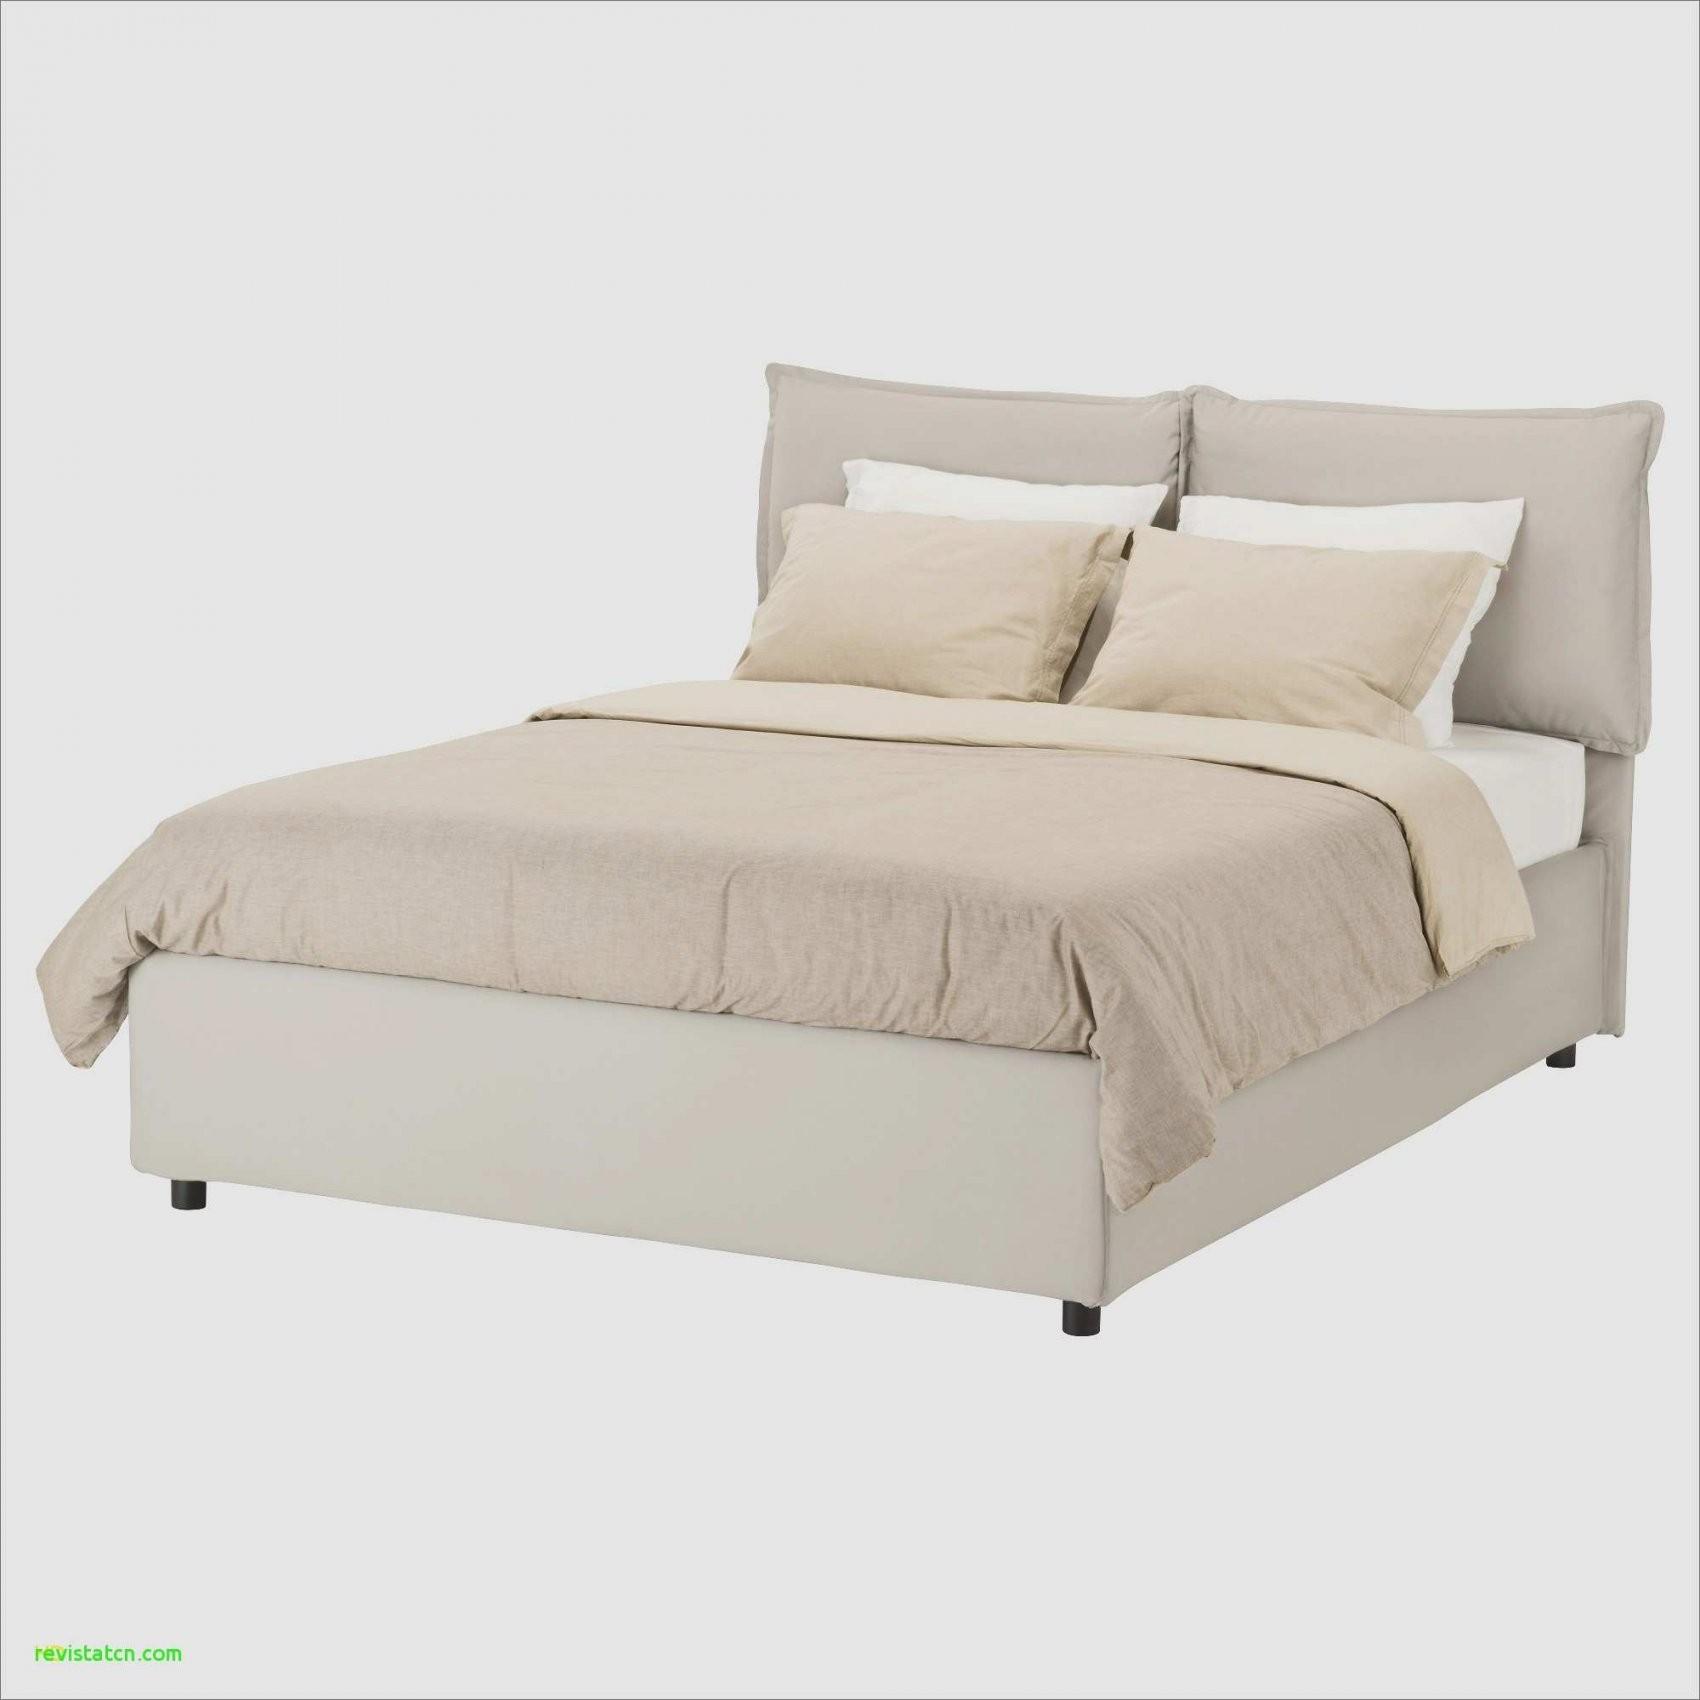 Ikea Malm Bed With Nightstands With Regard To Household 19 Beautiful von Ikea Betten 160X200 Bild